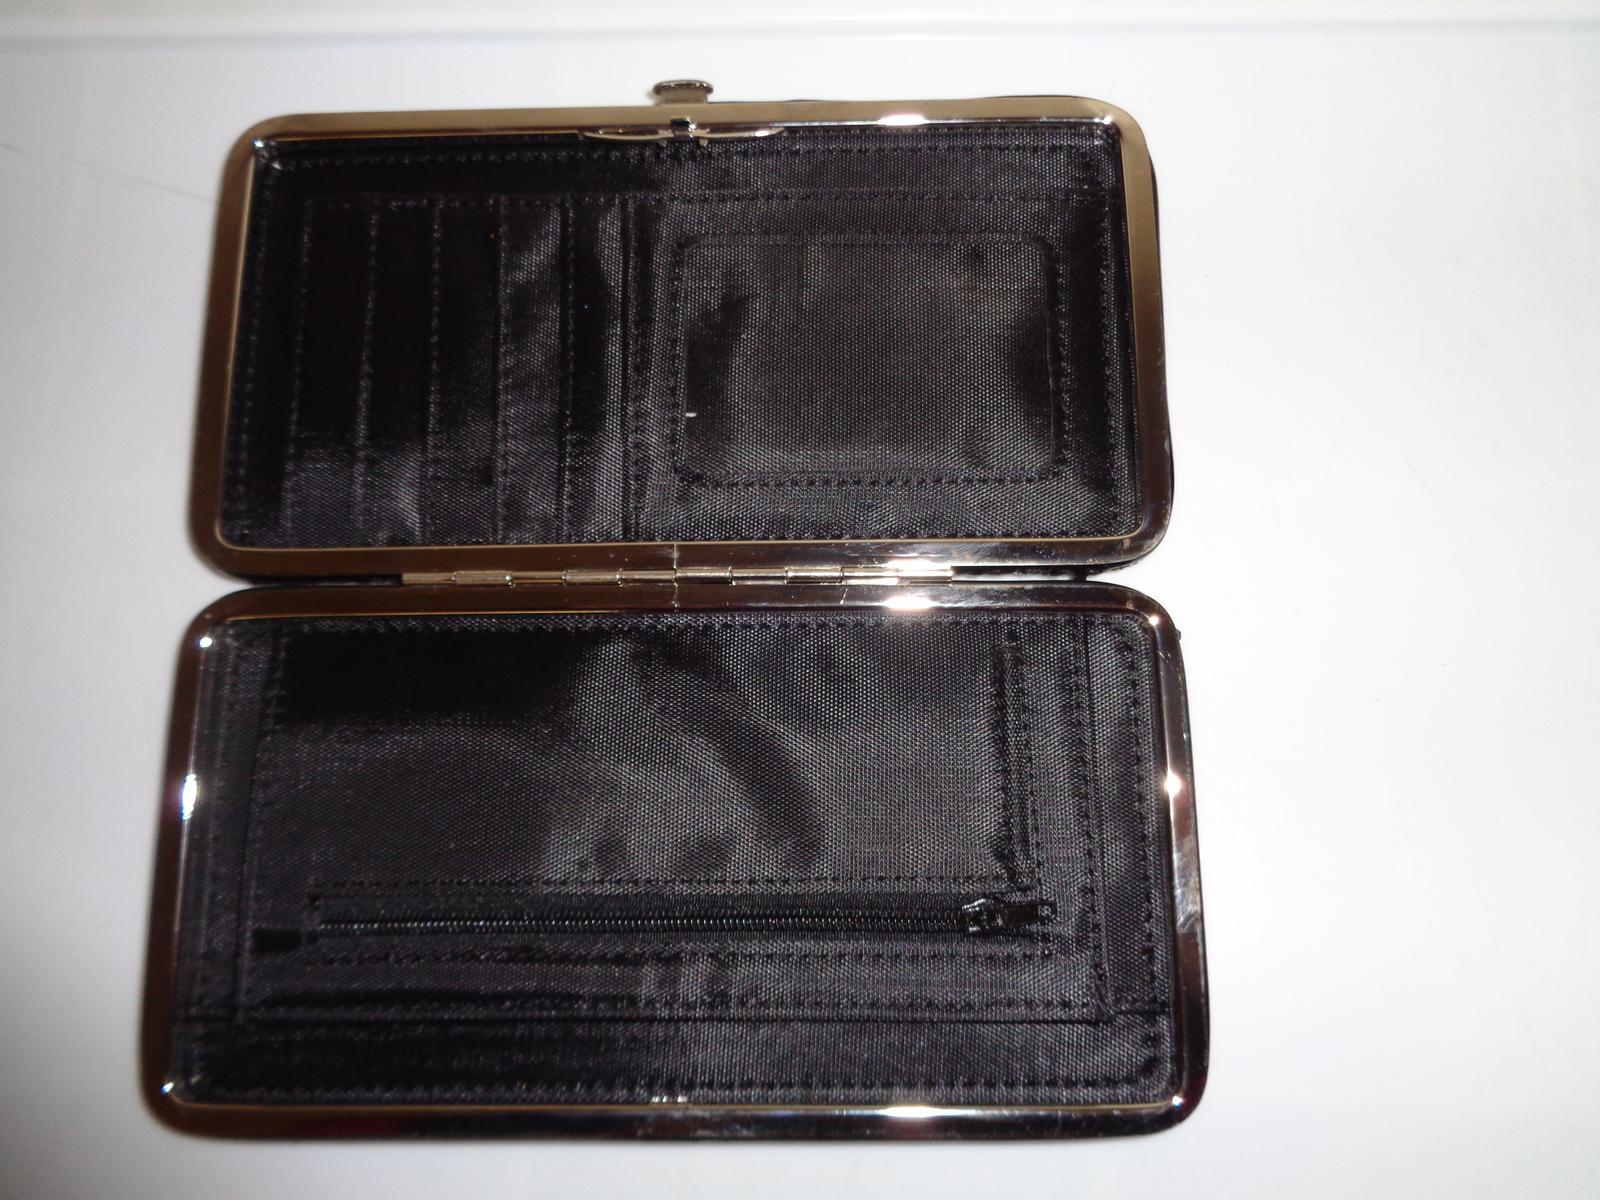 Black Glitter Clutch Small Purse Handbag Wallet Evening Formal Bag Fancy Style - Handbags U0026 Purses